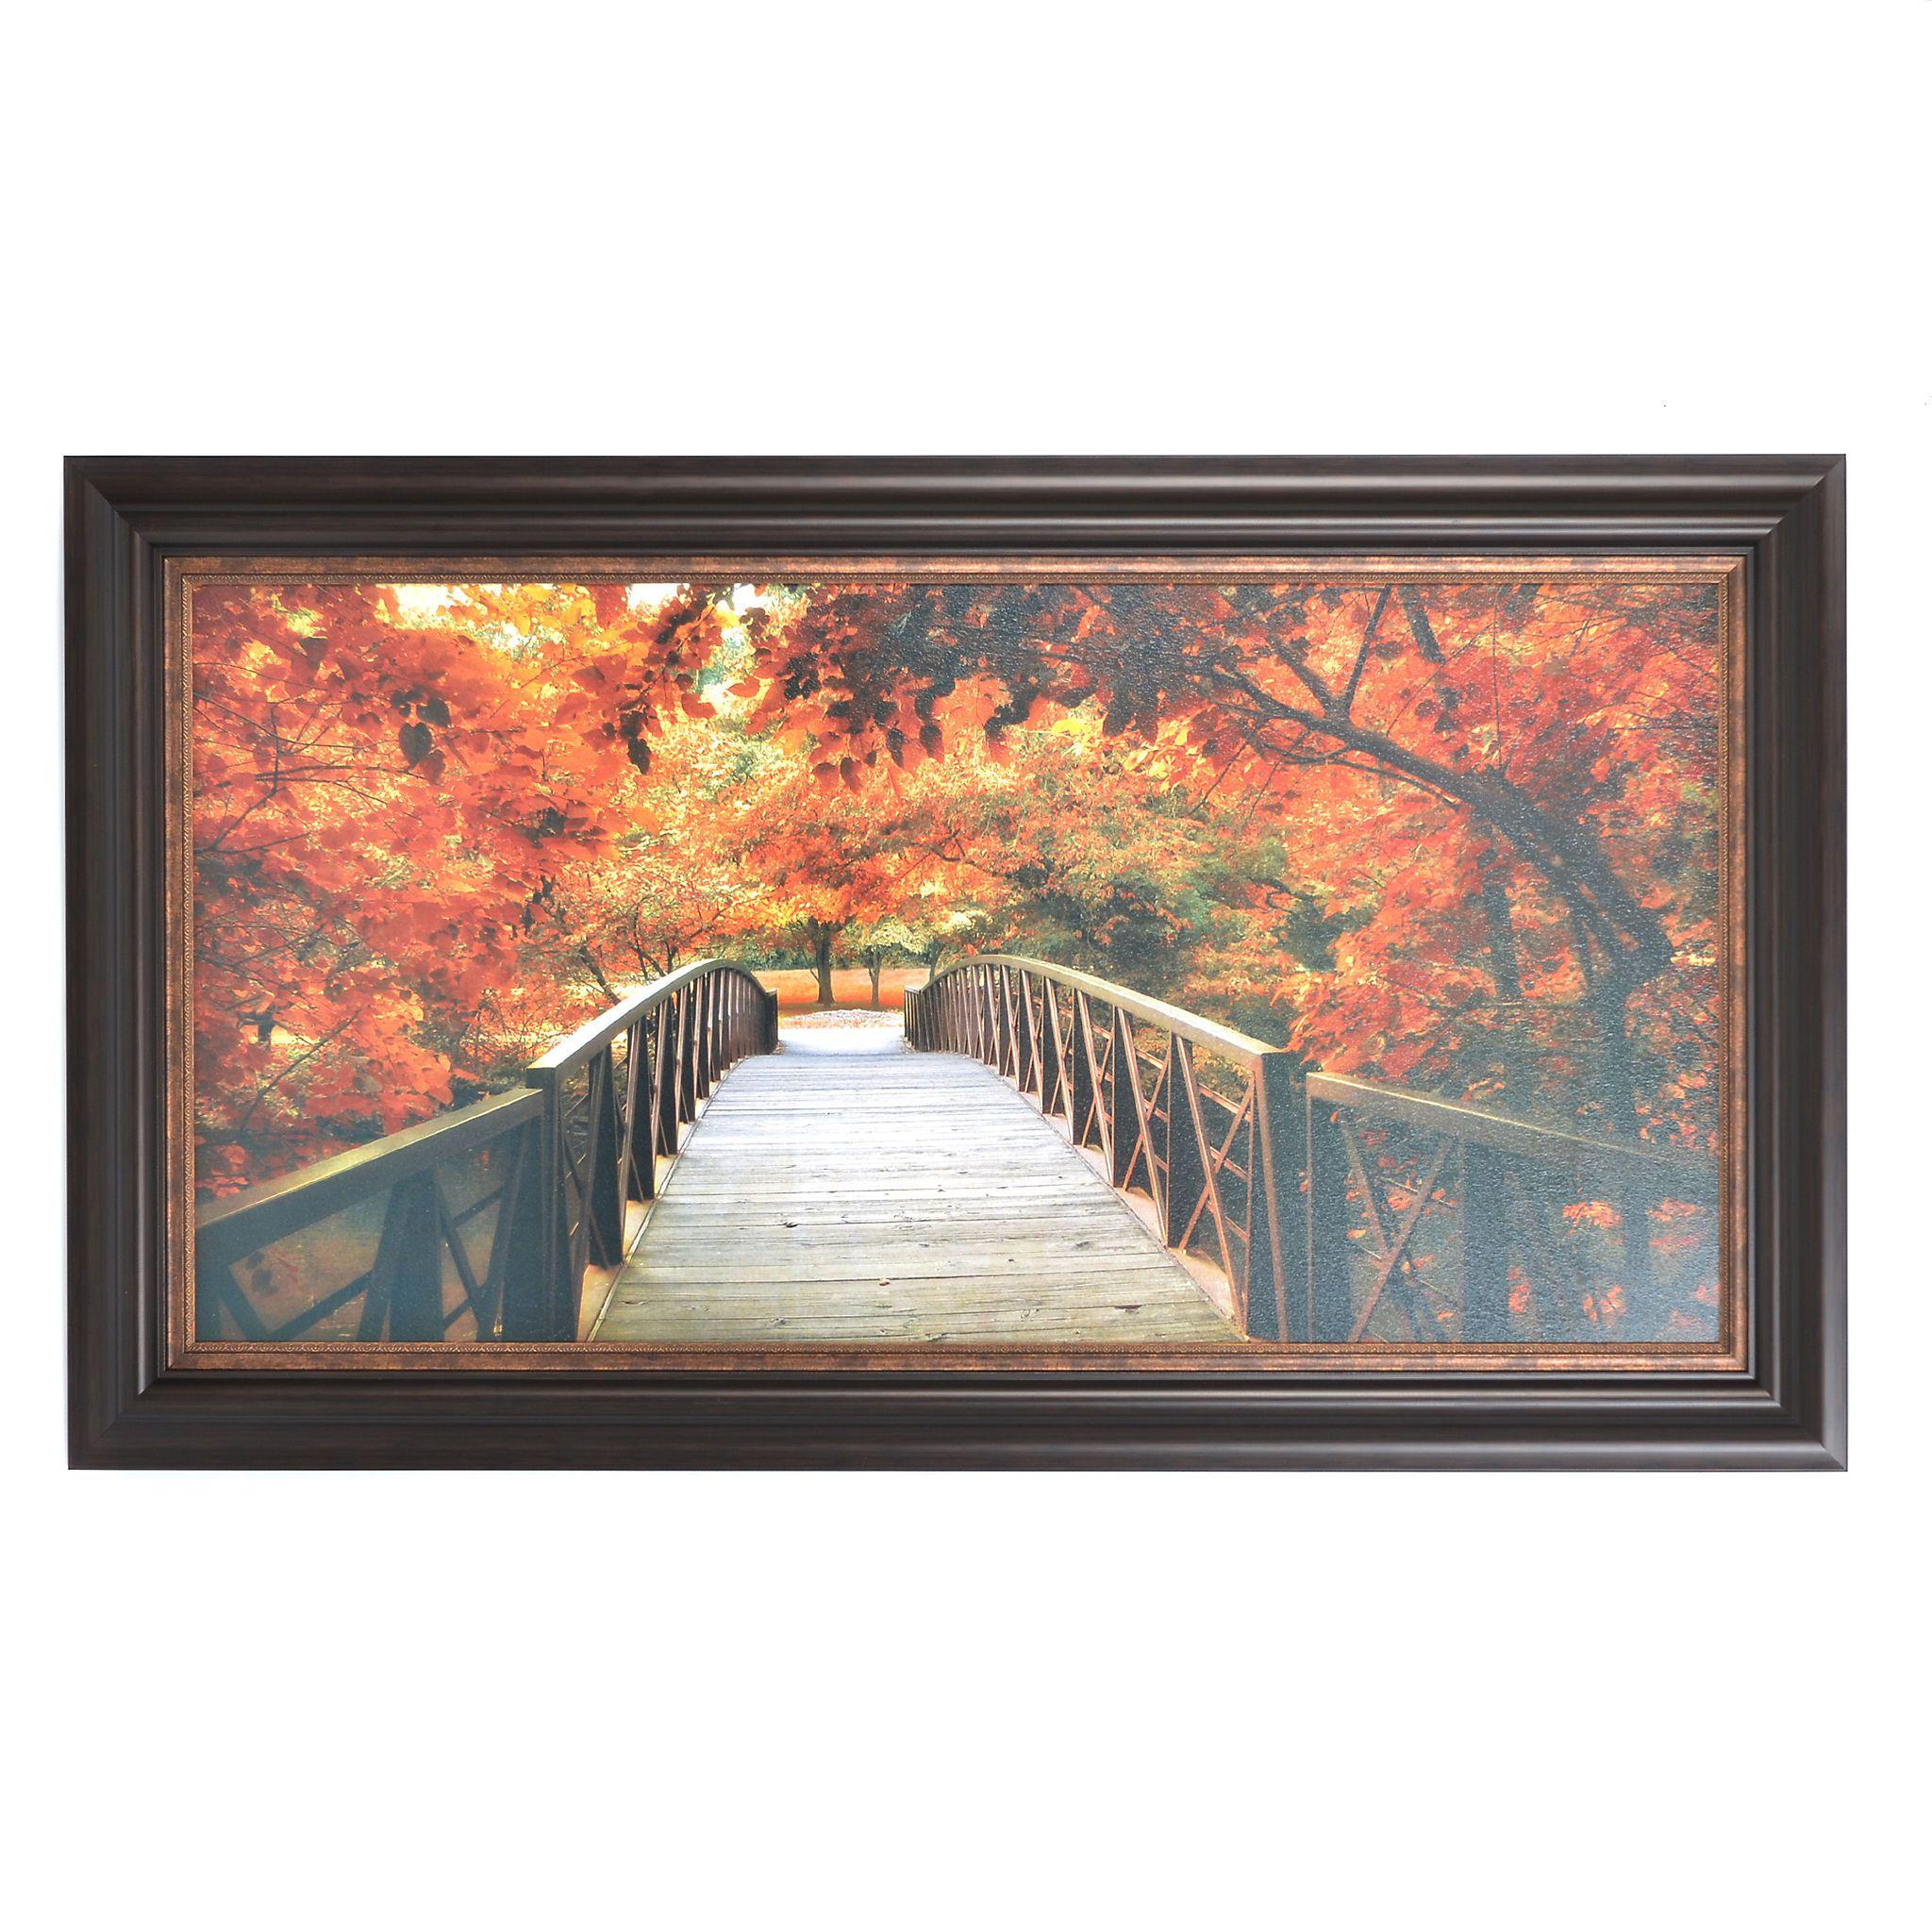 Entrance to Autumn Framed Art Print | House